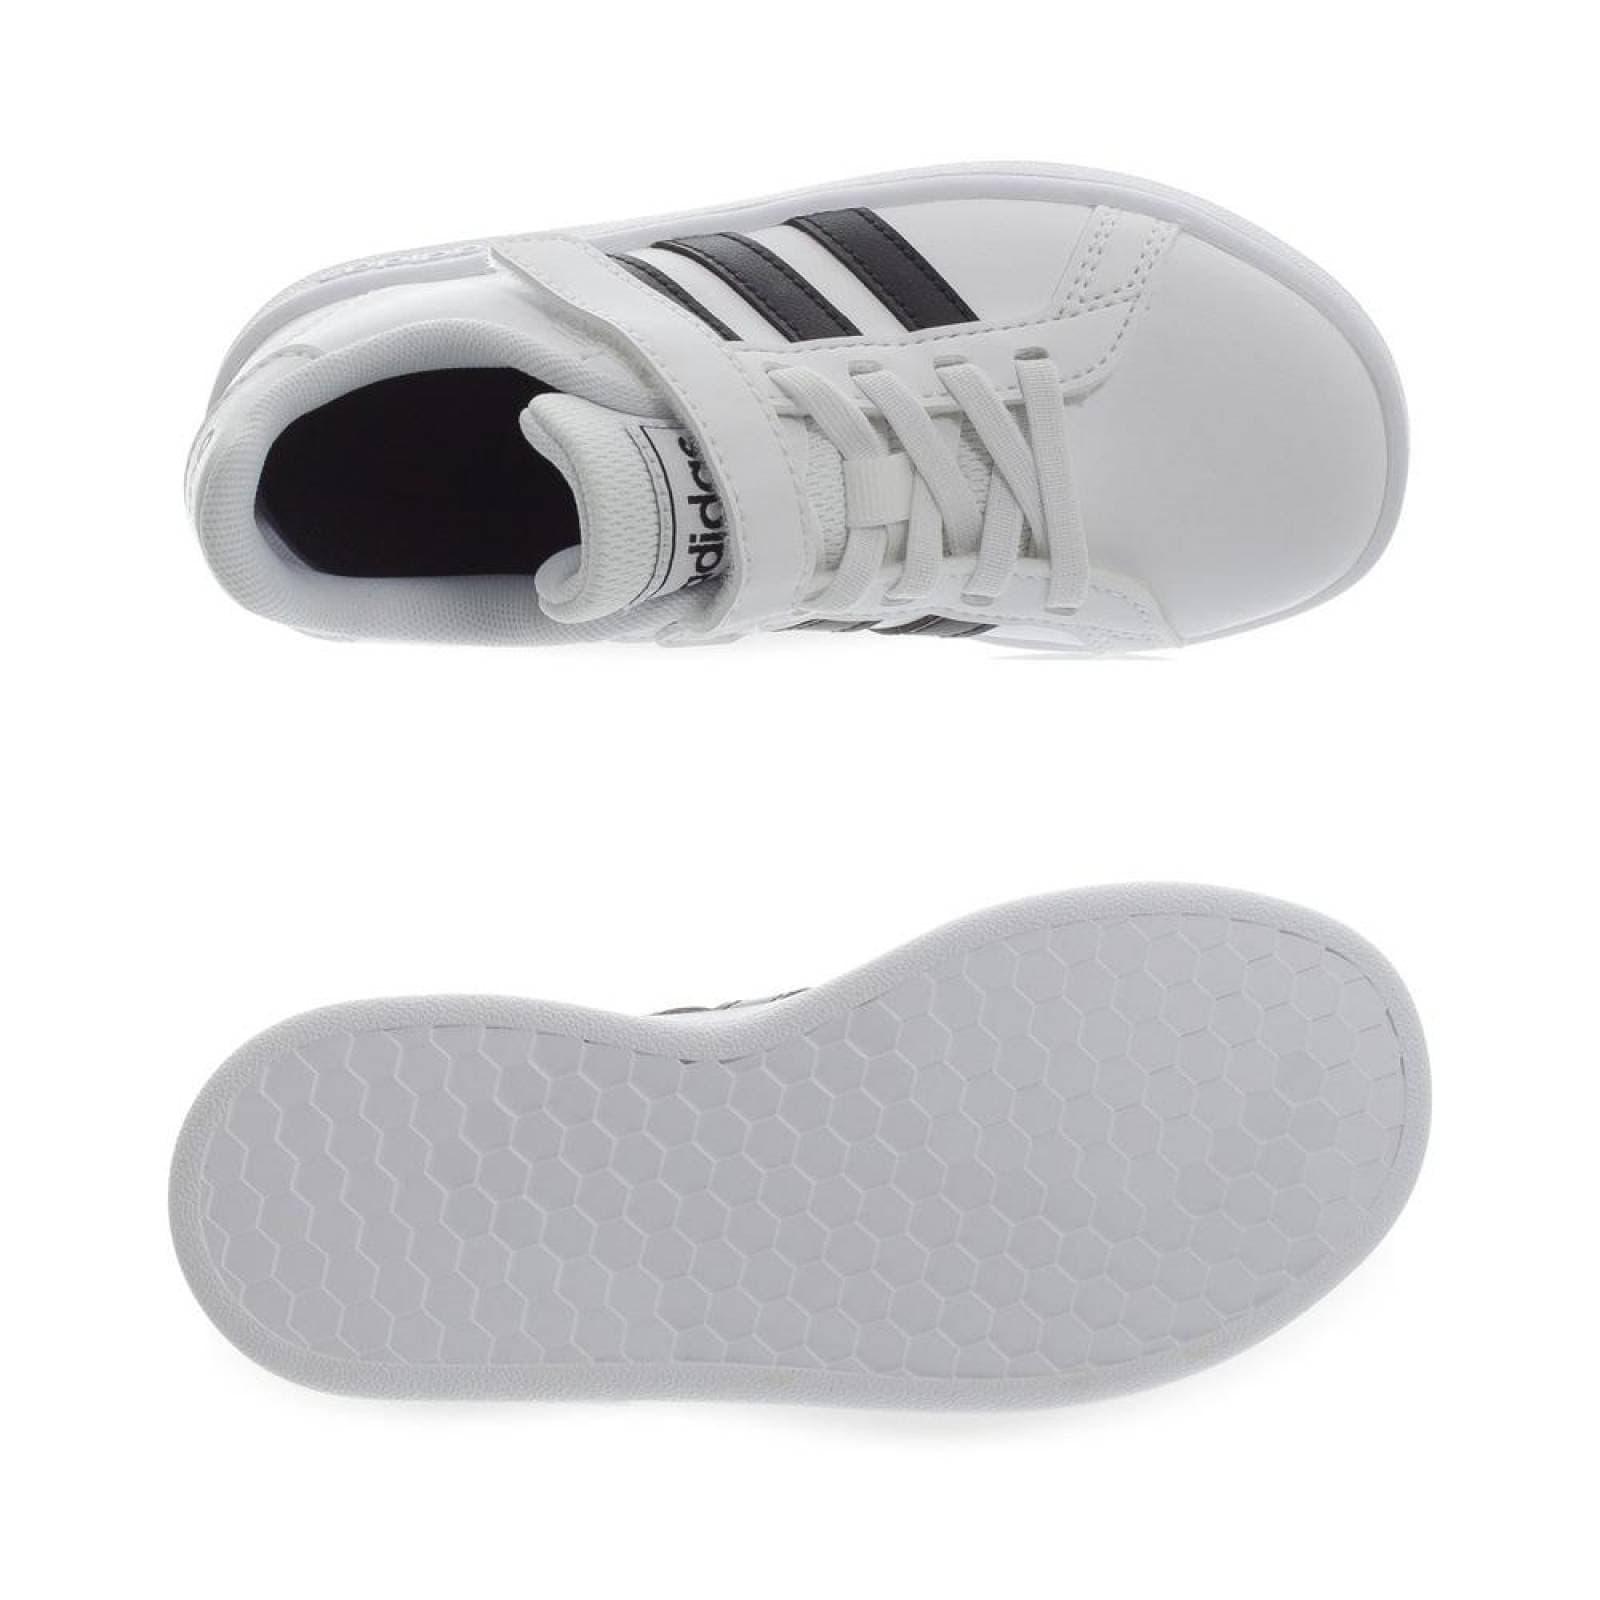 Tenis Adidas Grand Court C - EF0109 - Blanco - Niños